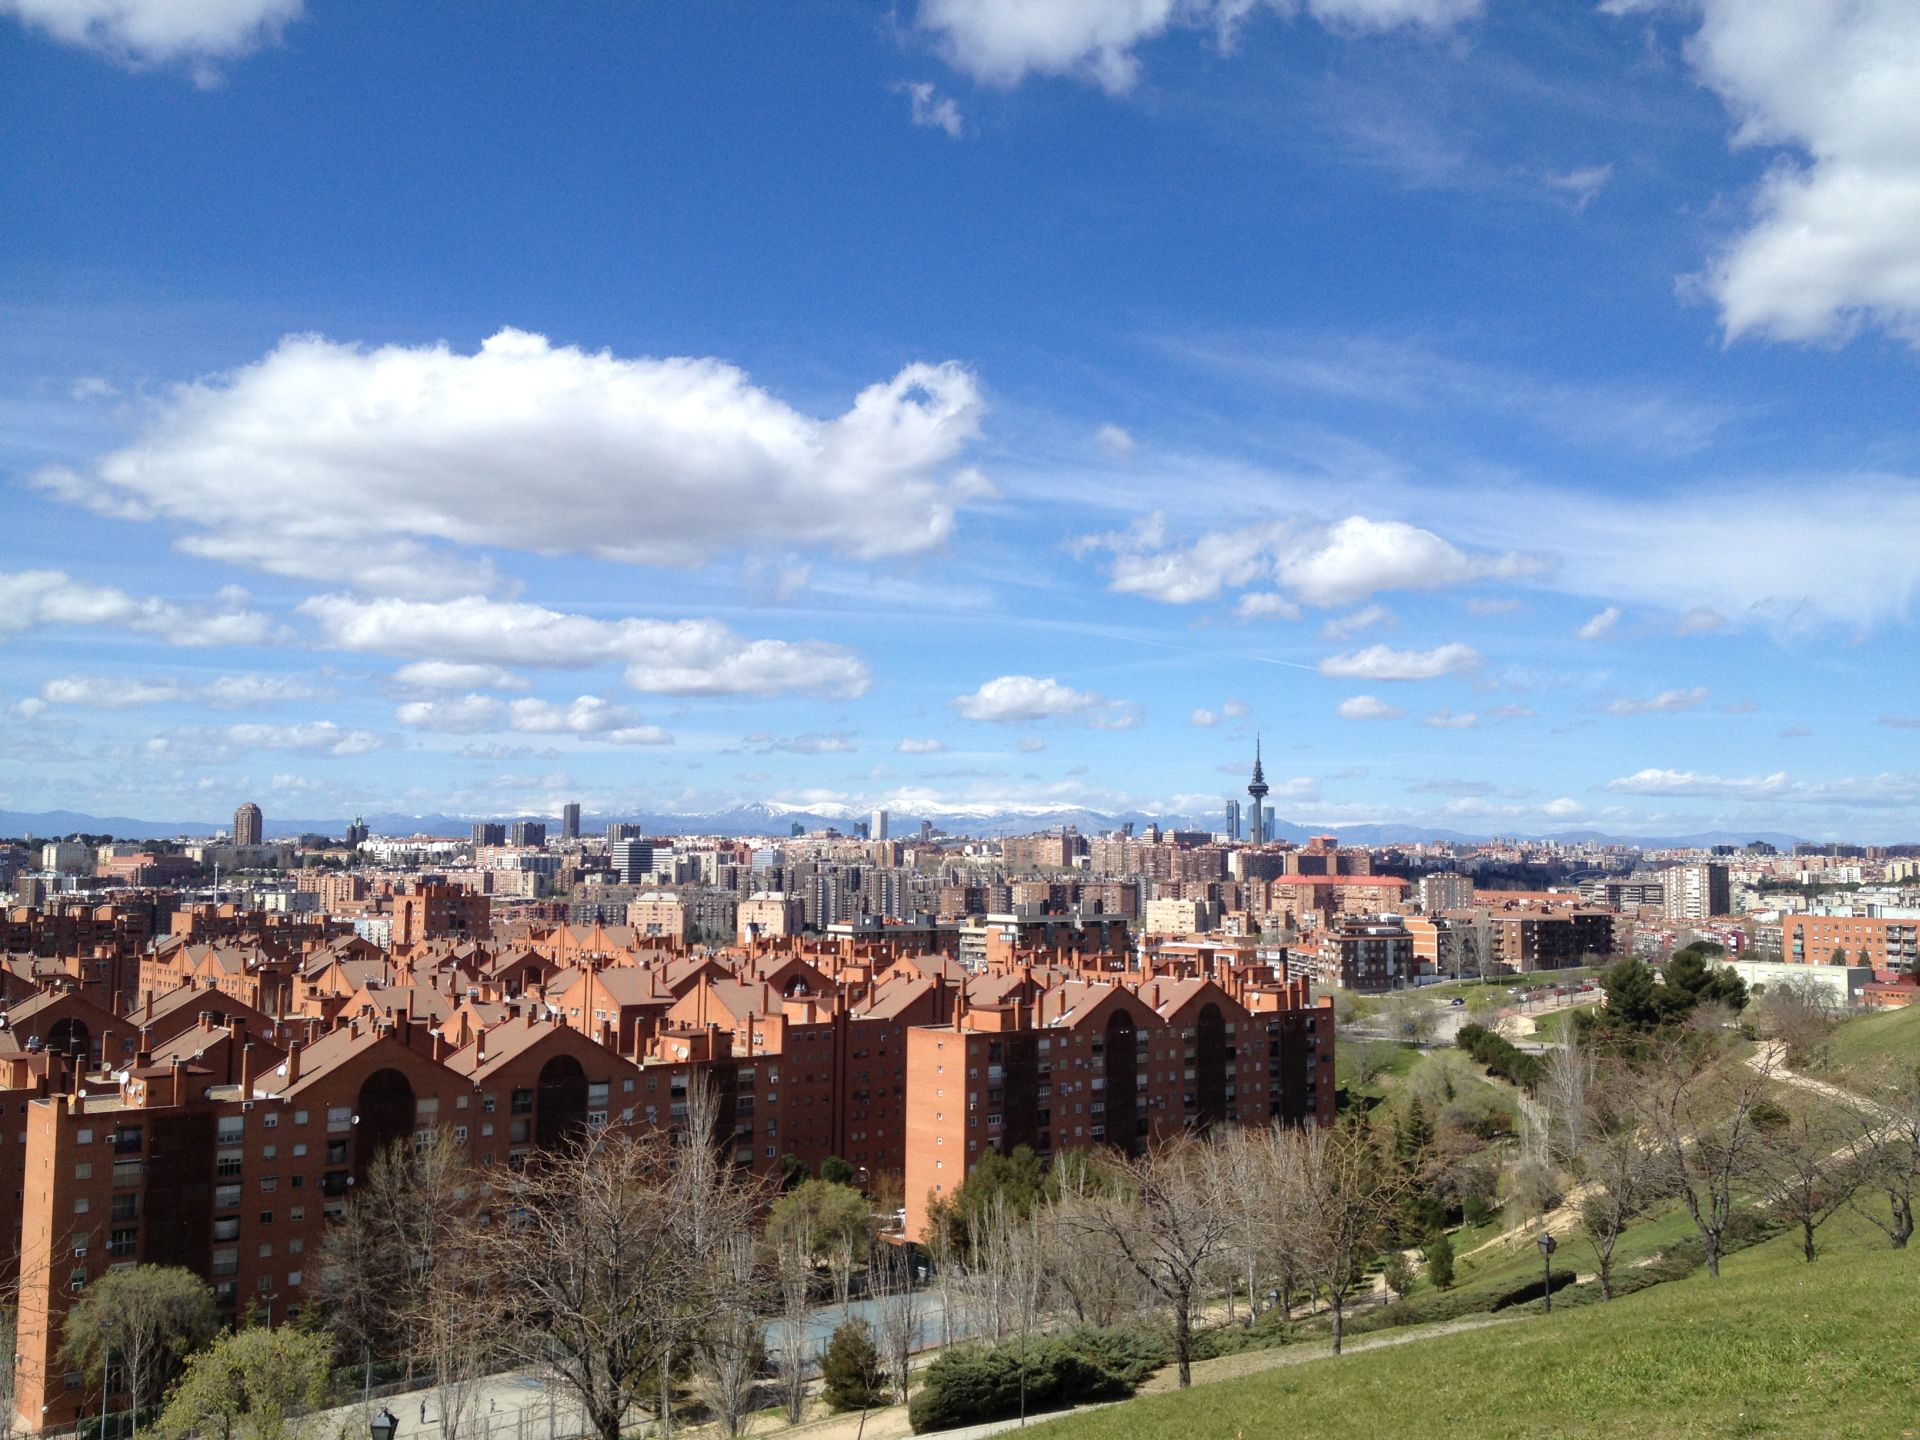 Aussichtspunkt Madrid: Parque Tío Pío